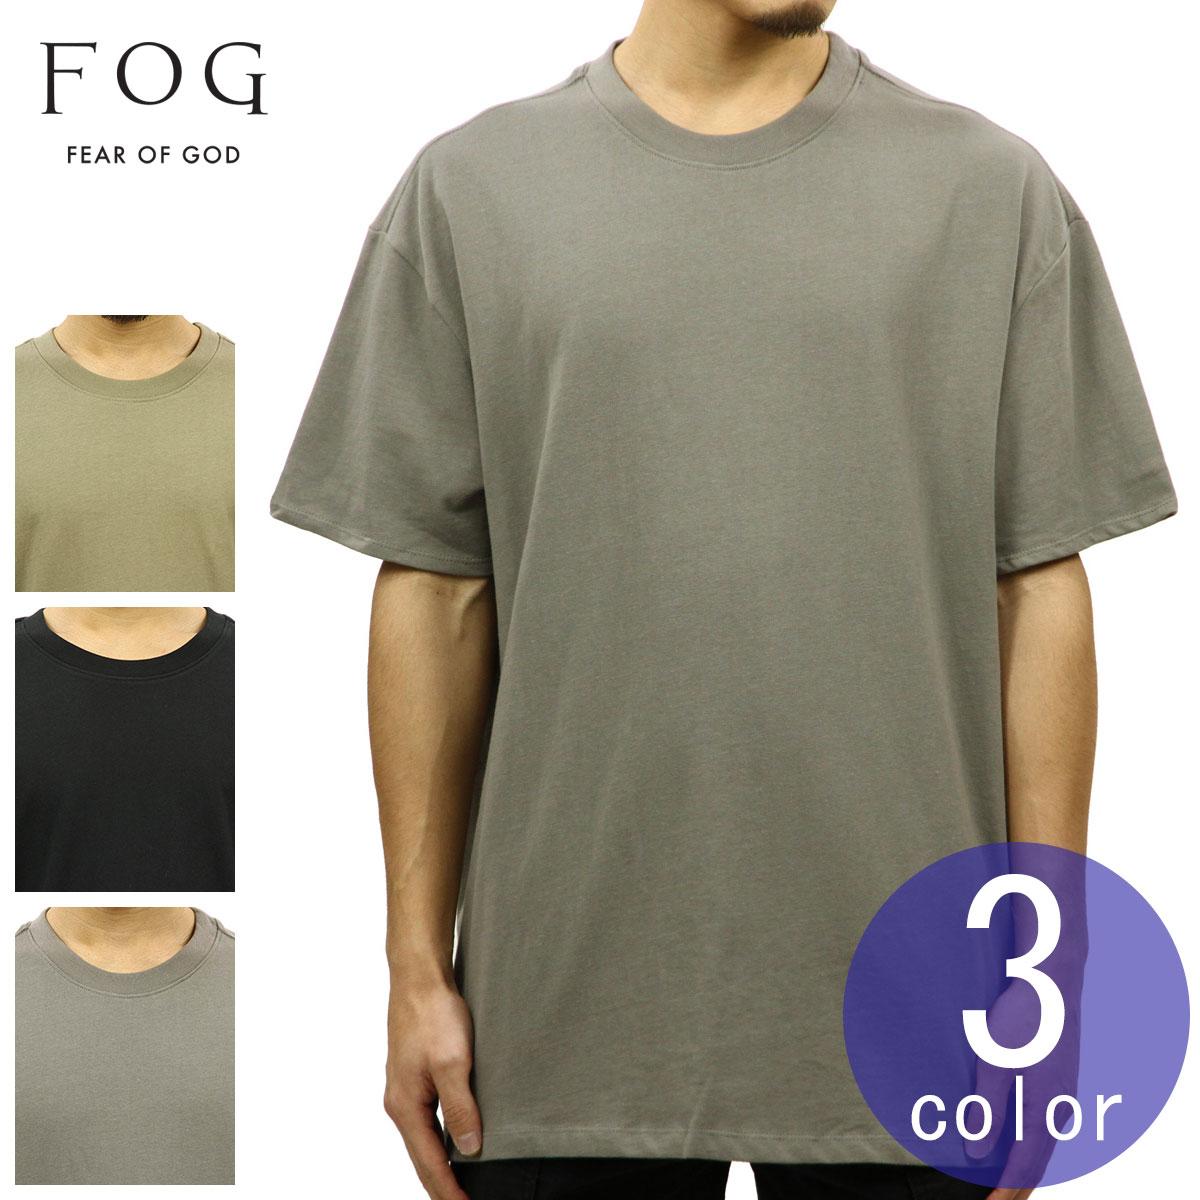 232619fe7574 Fear of god FEAR OF GOD regular article men plain fabric short sleeves T- shirt ...